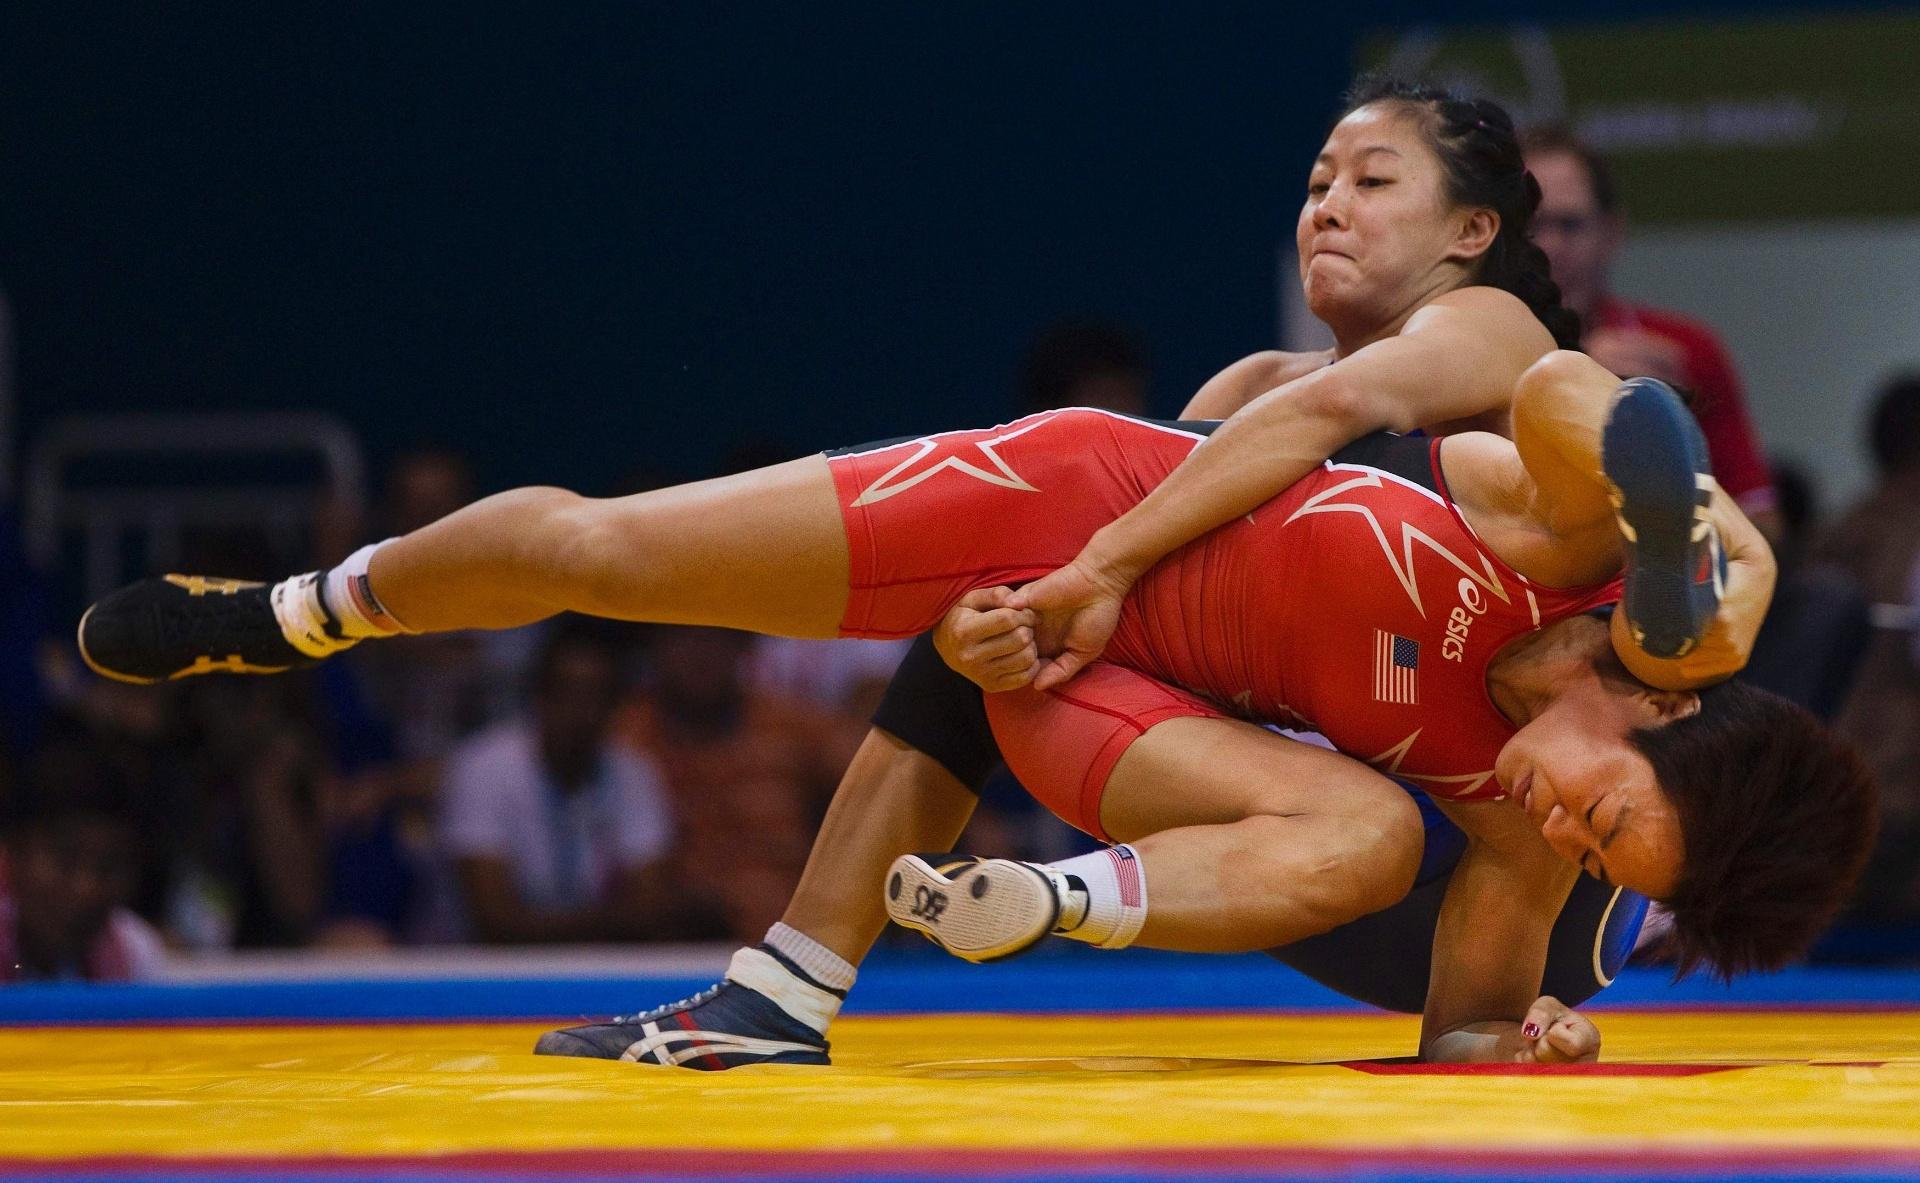 Na final da luta olímpica, categoria até 48kg, a canadense Carol Huynh (de azul) derrotou a norte-americana Clarissa Chun